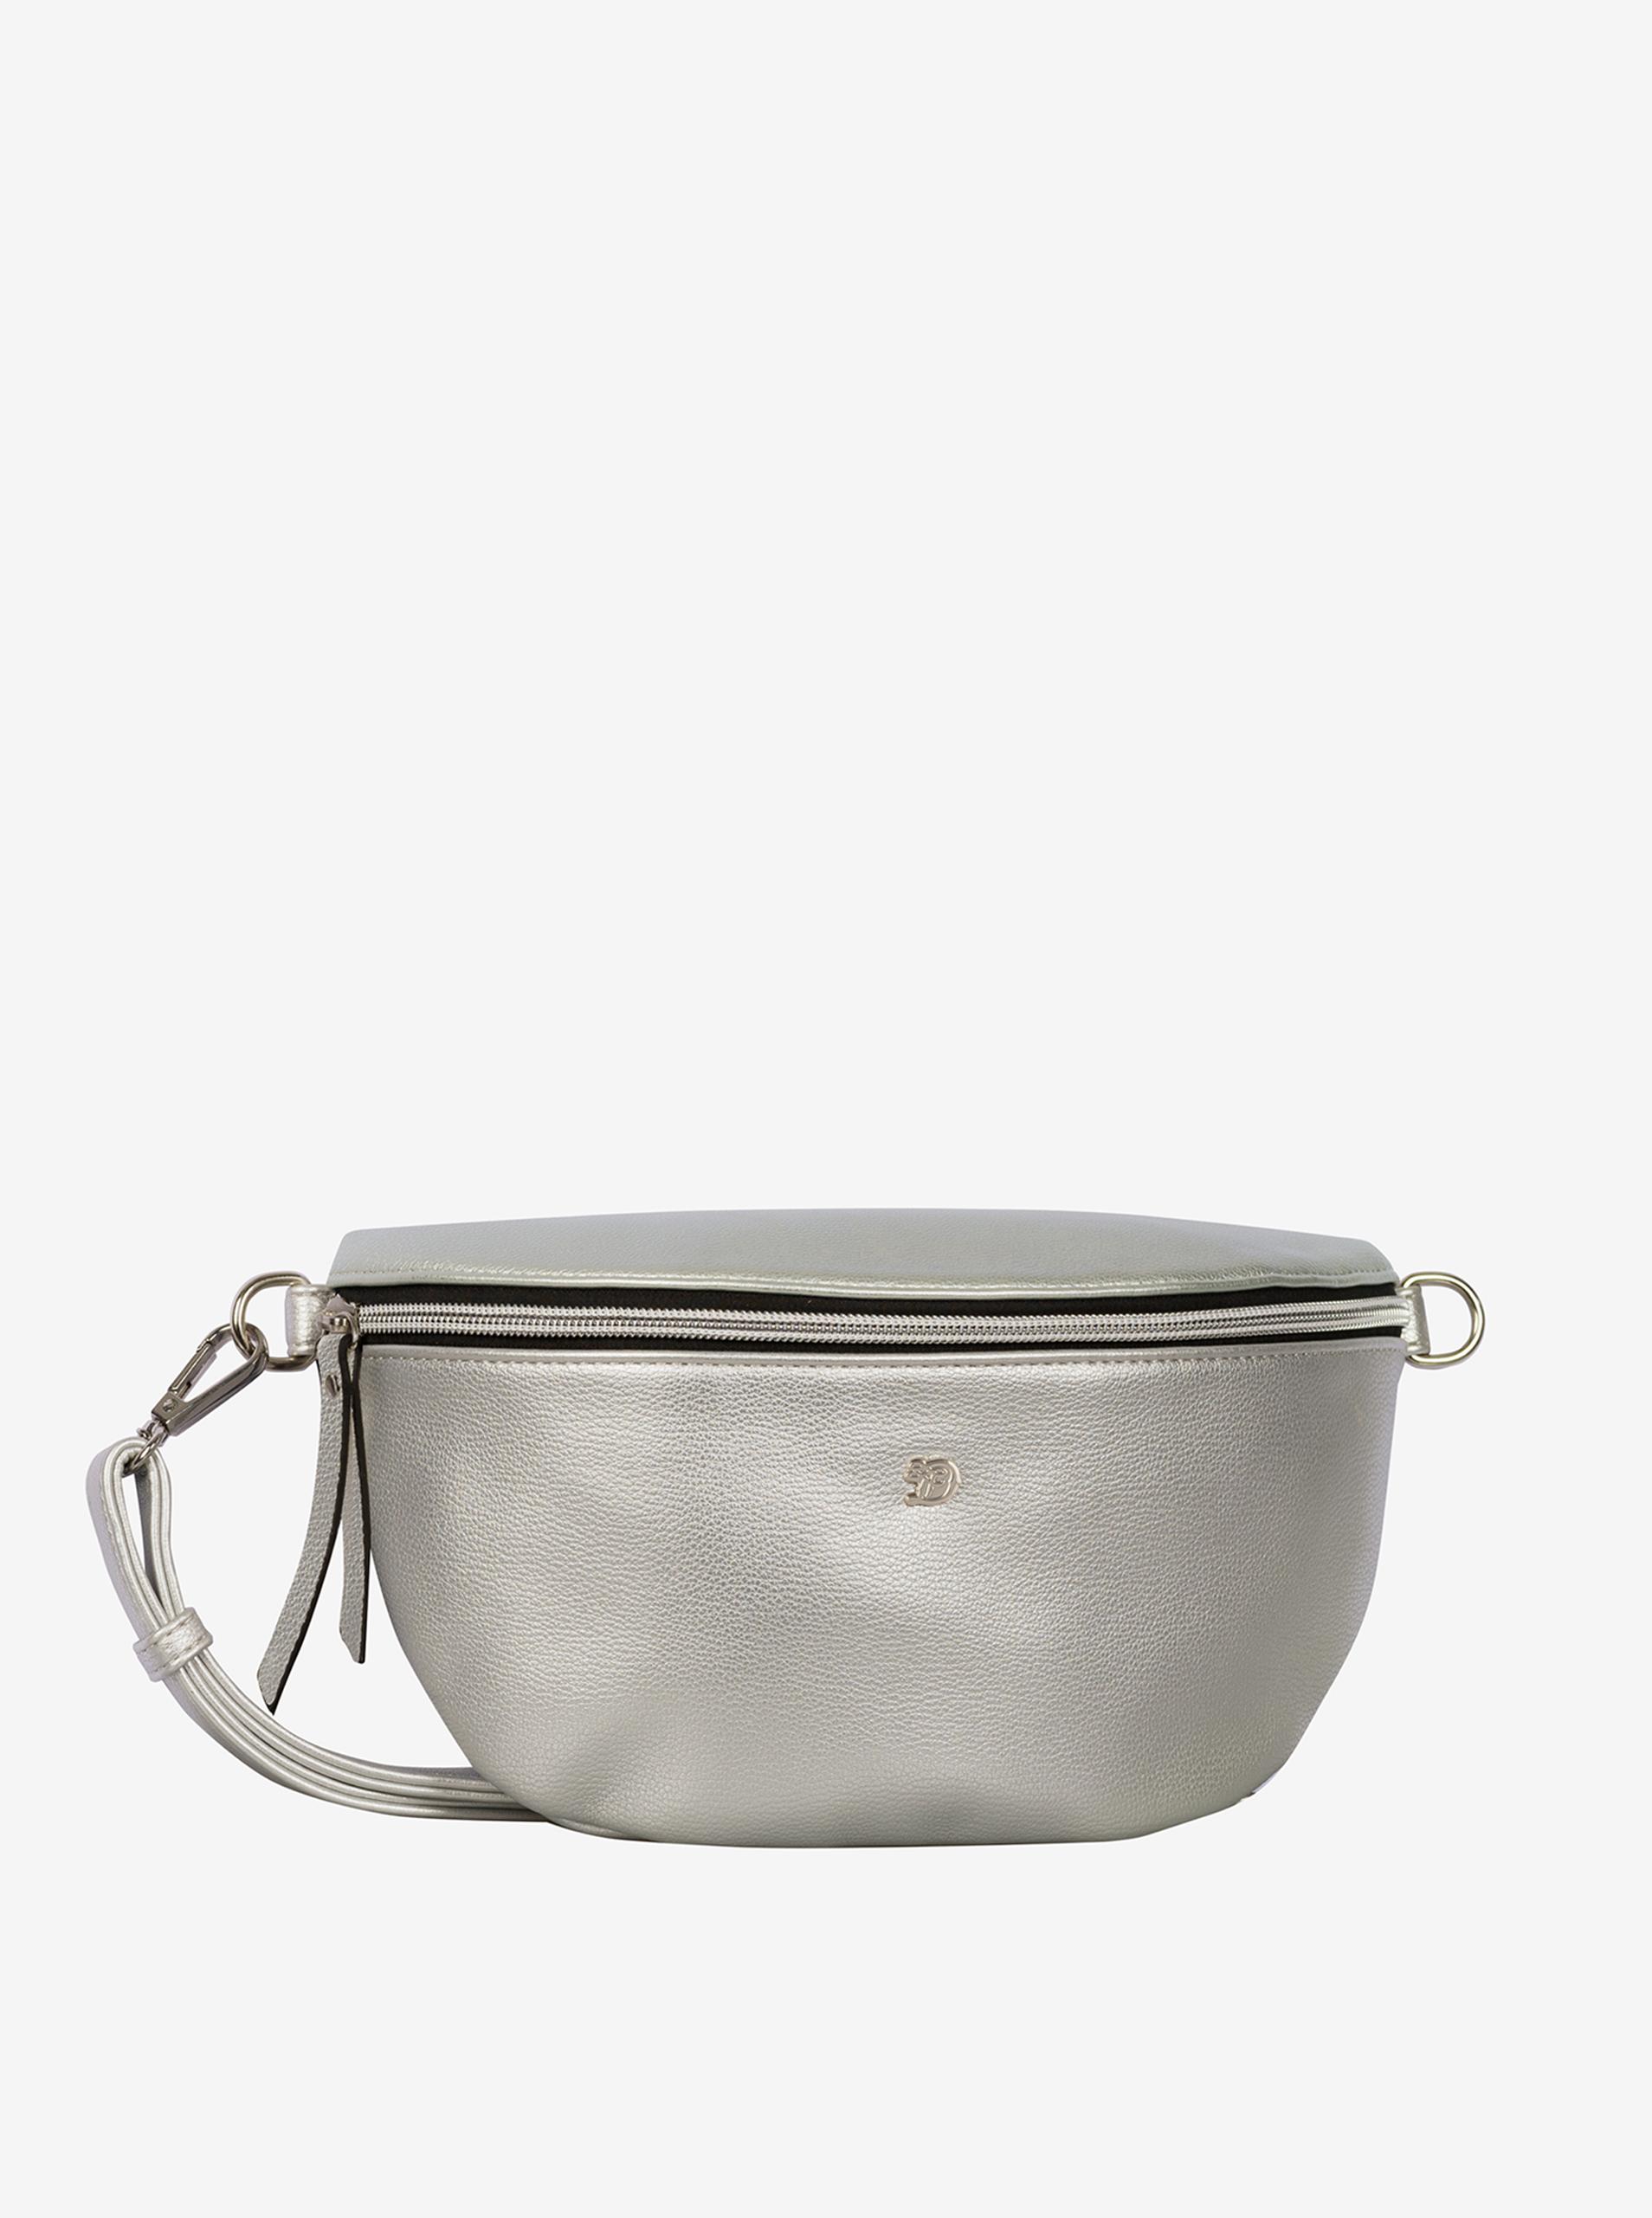 Borsa da donna con rene in argento Tom Tailor Denim